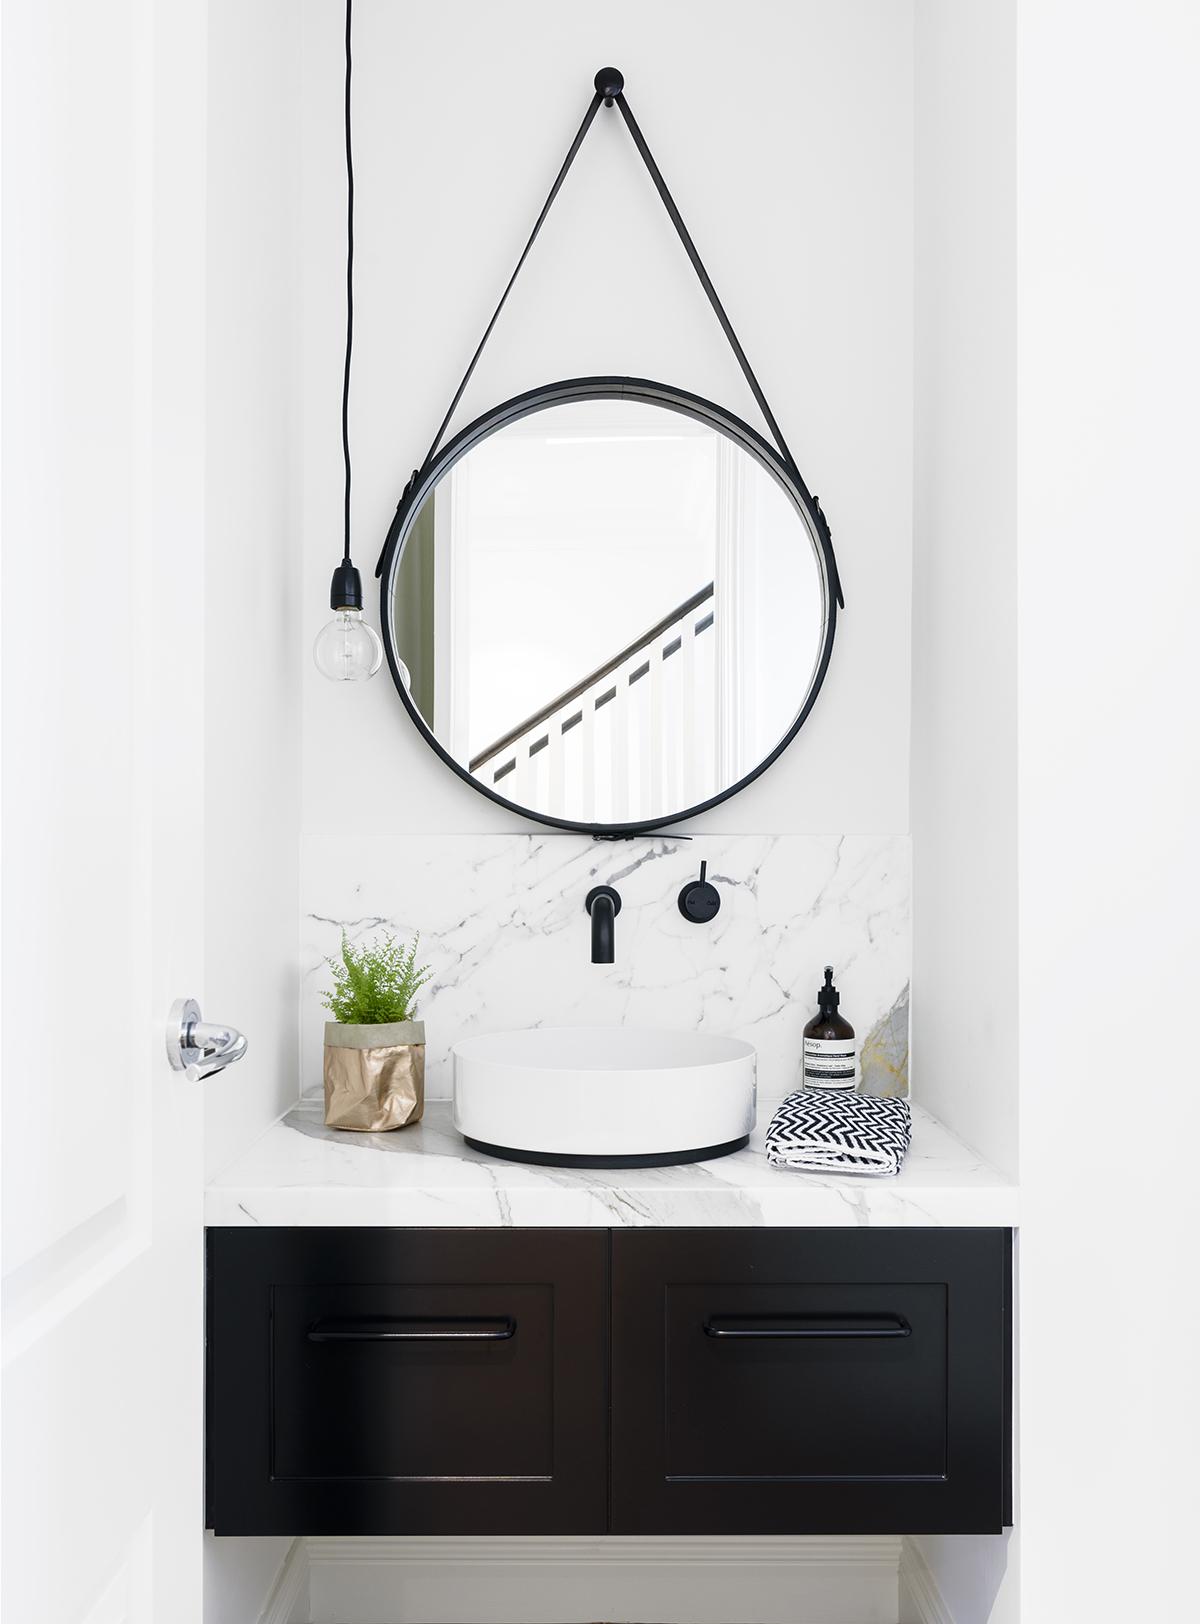 Photography  Daniel Aulsebrook  /   Interior design  Biasol